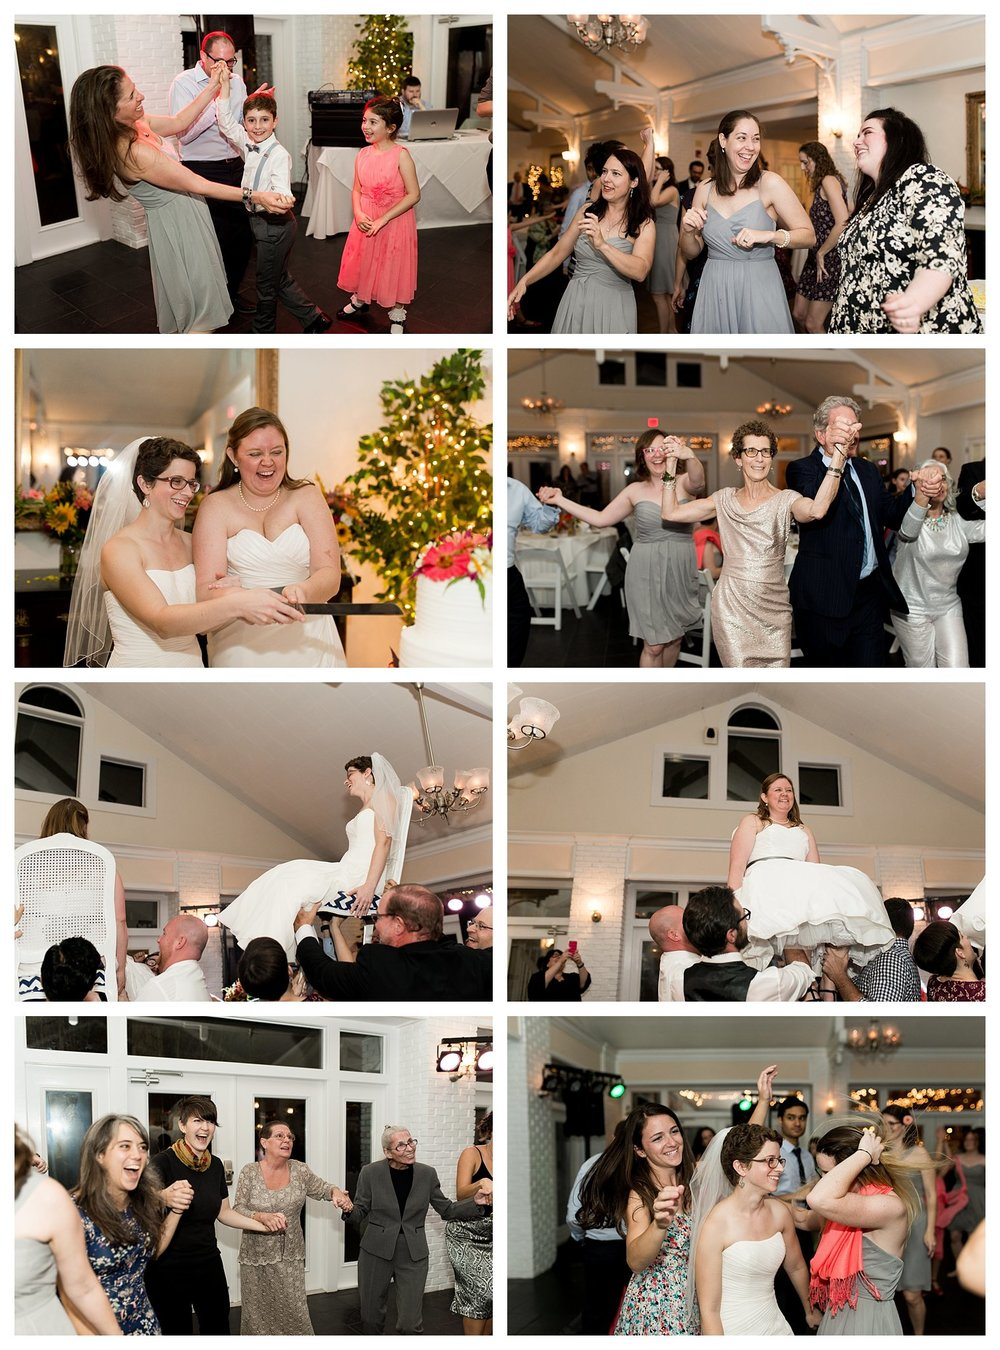 everleigh-photography-cincinnati-wedding-photographer-cincinnati-wedding-photography-sweetwater-branch-inn-gainesville-florida-wedding-51